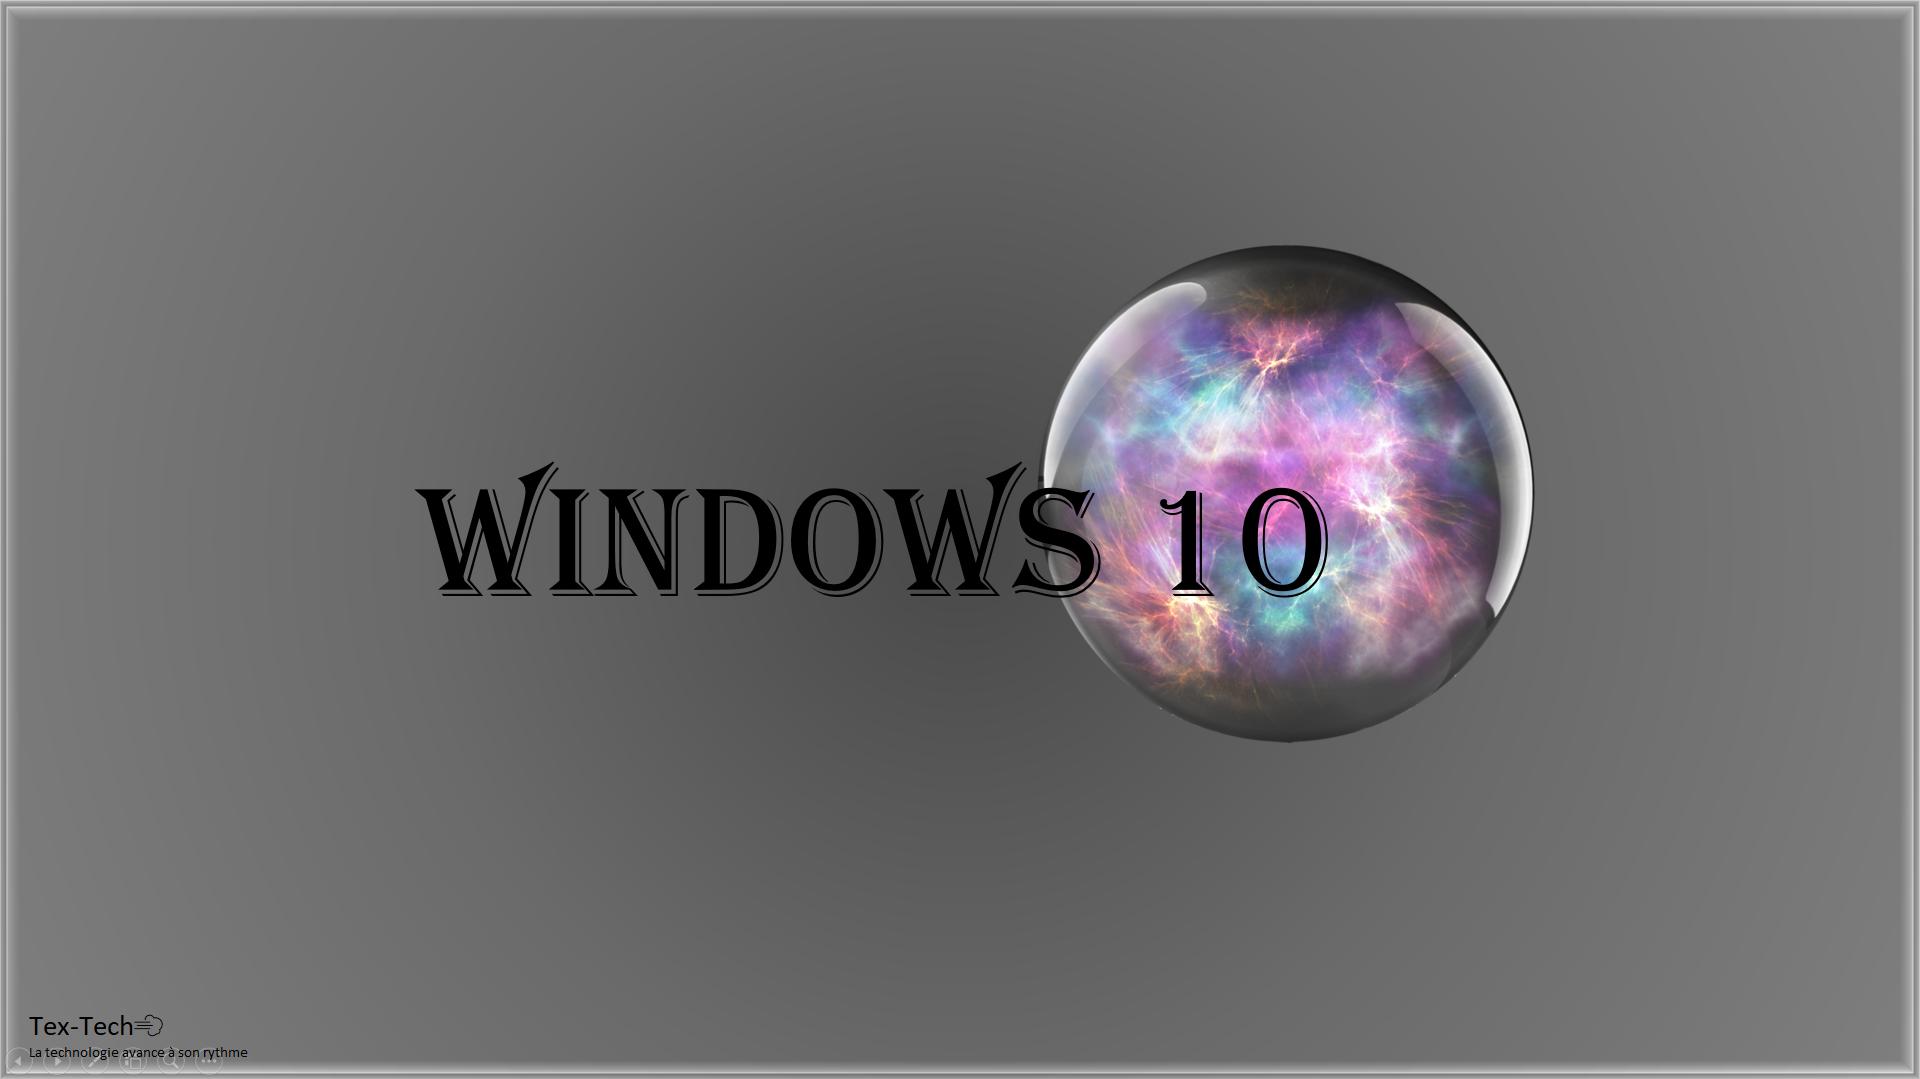 Fond d'écran Windows 10 n°1